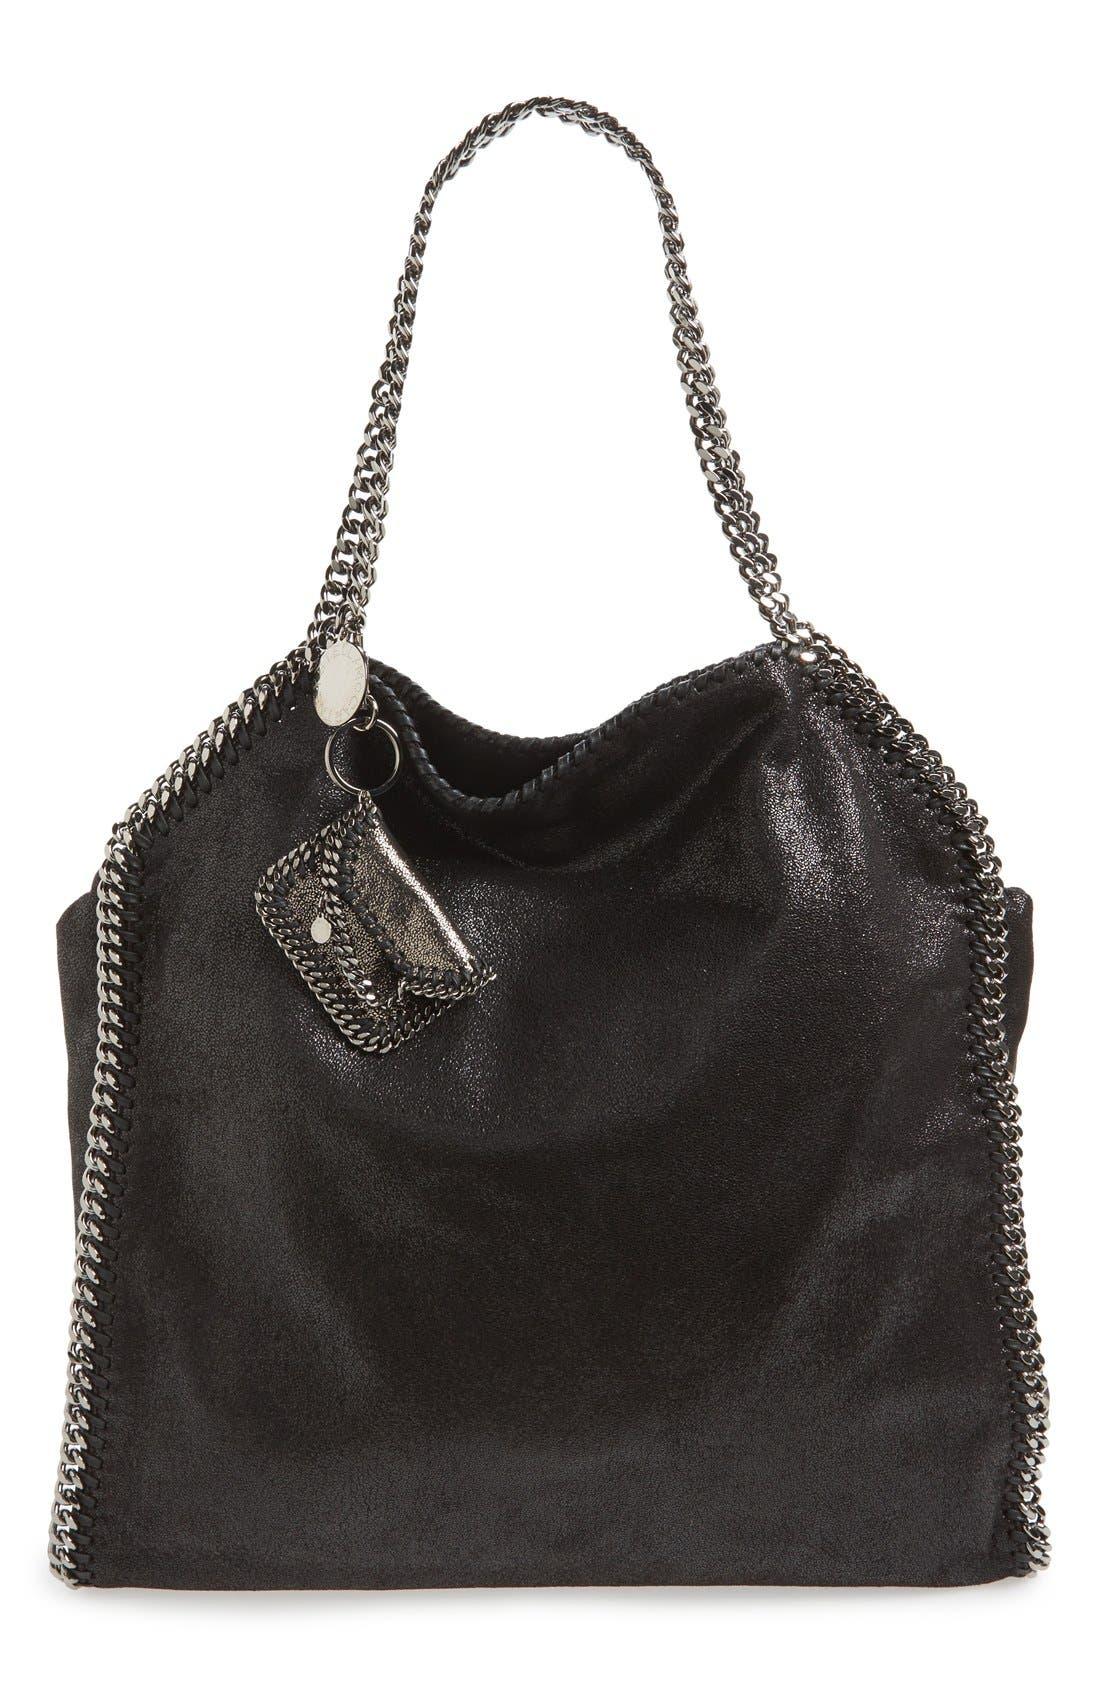 'Falabella' Bag Charm,                             Alternate thumbnail 2, color,